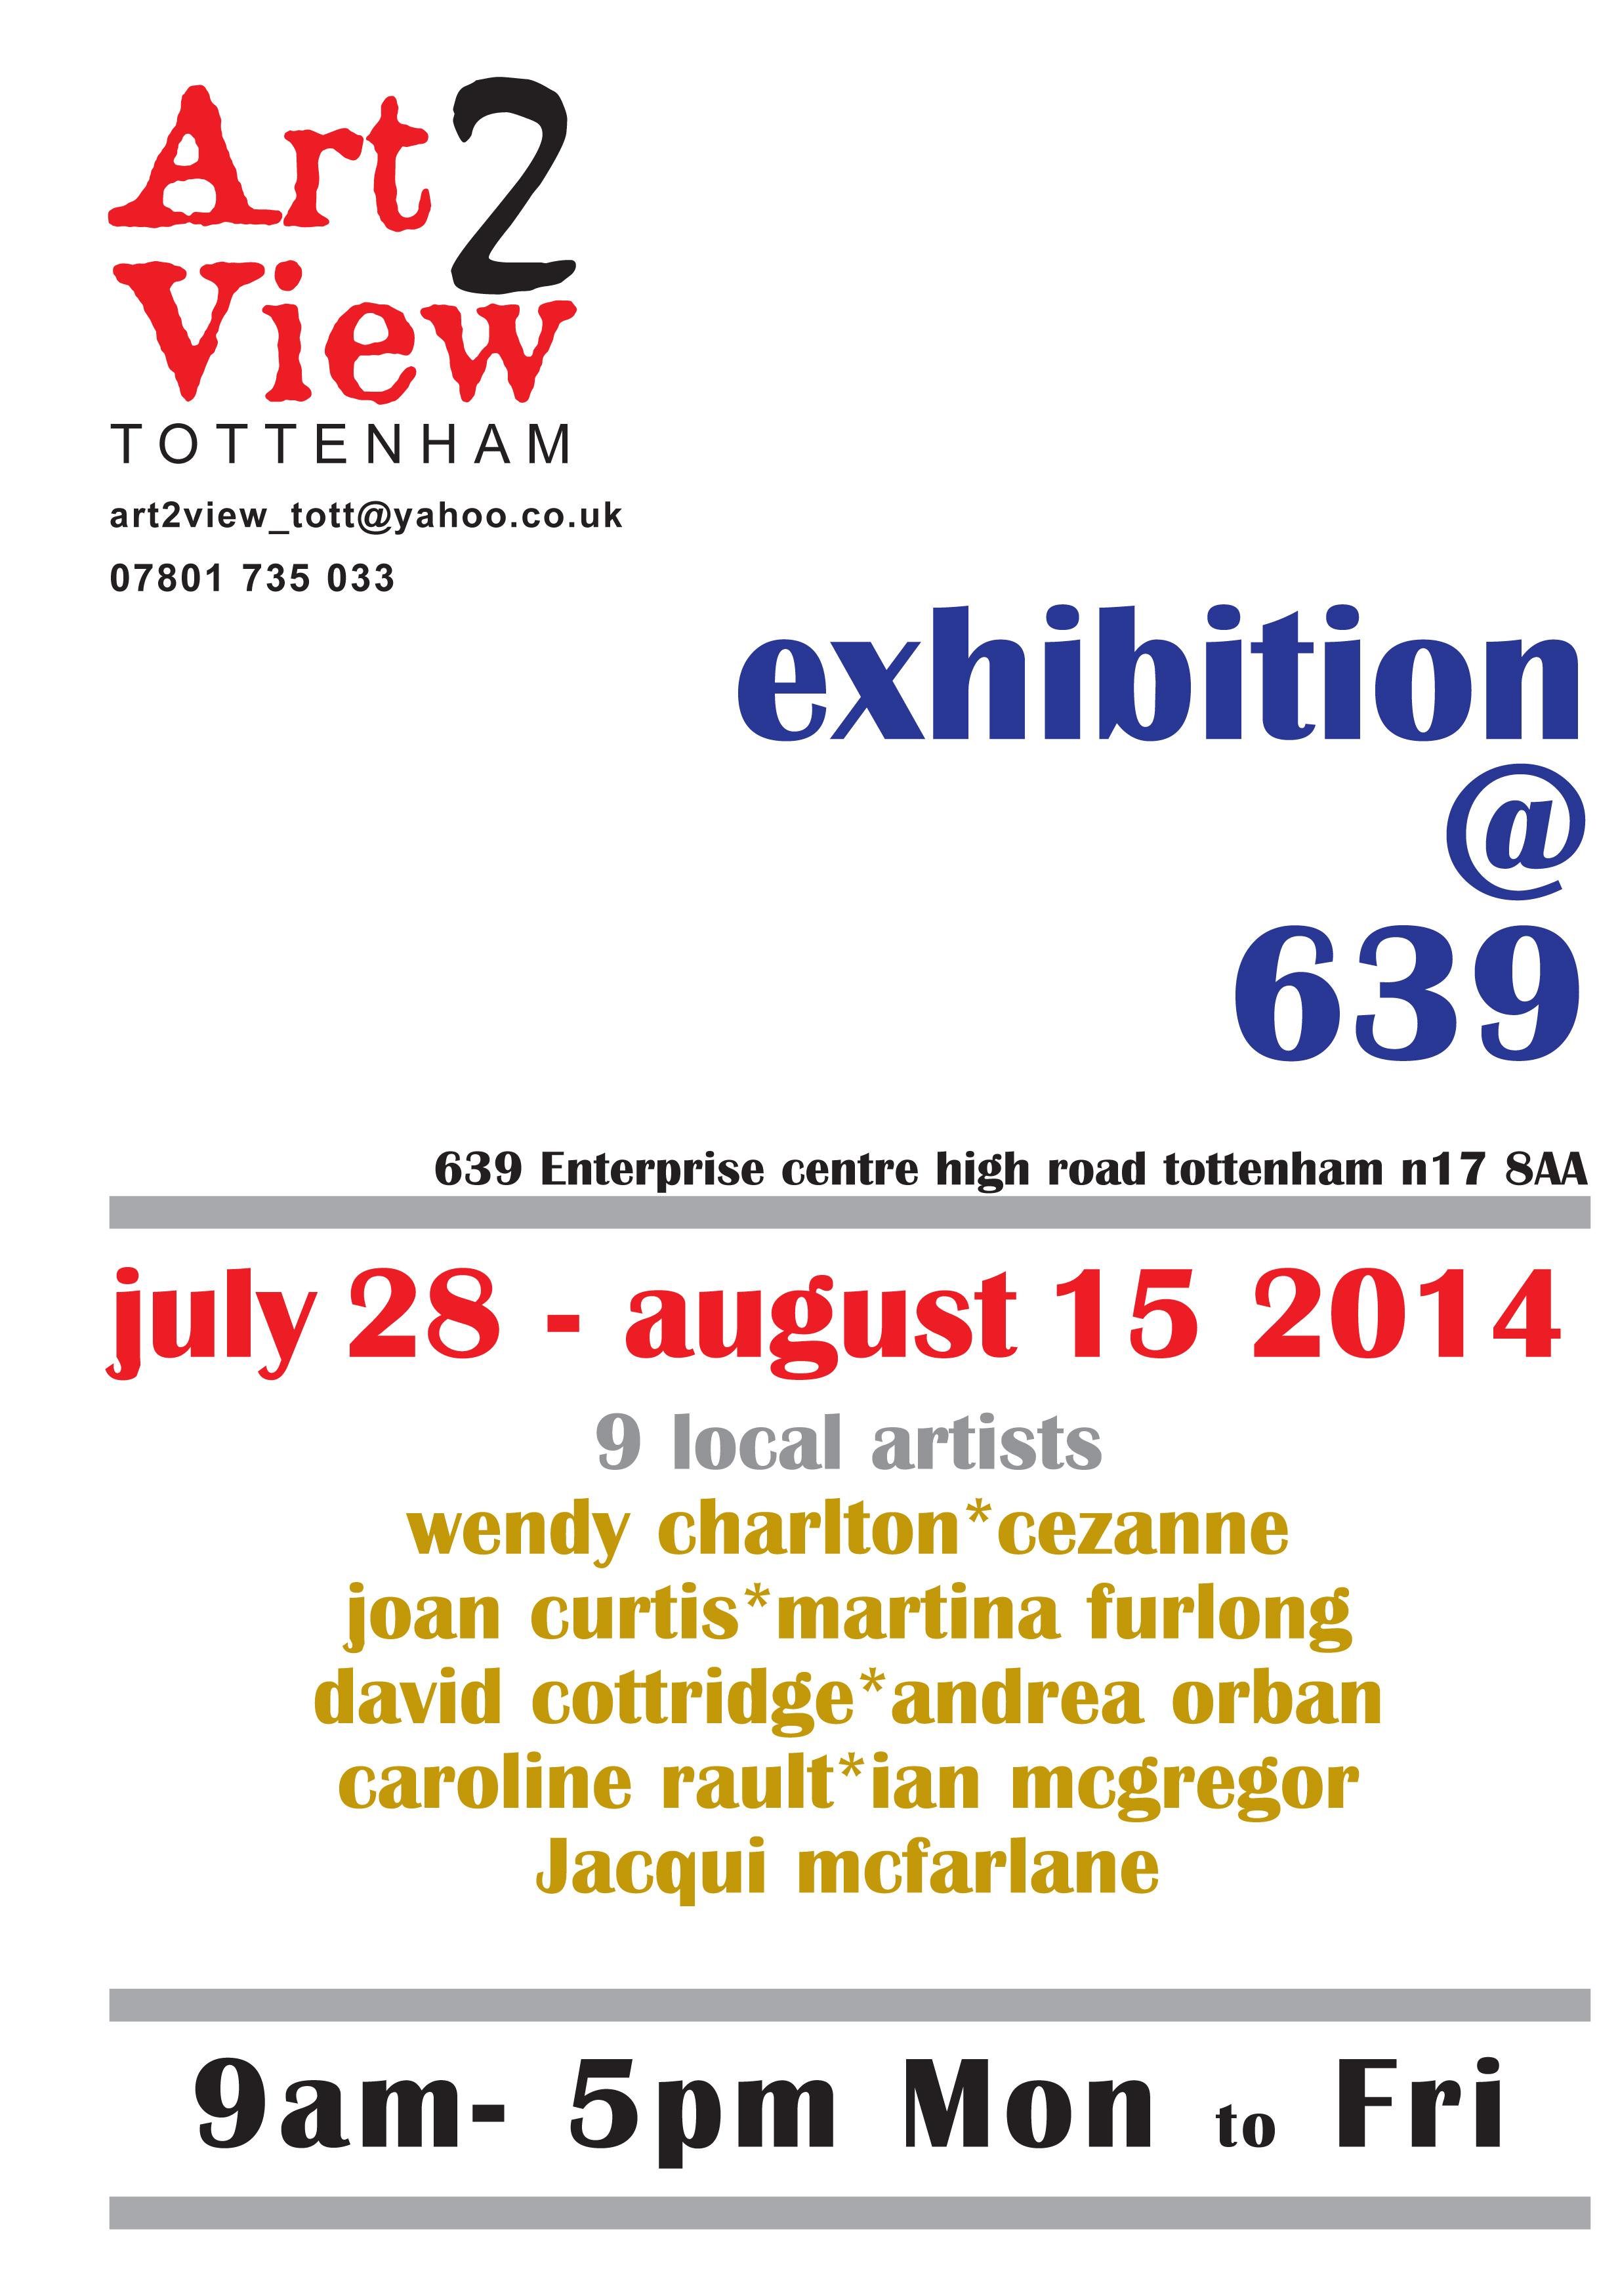 art2view Exhibition